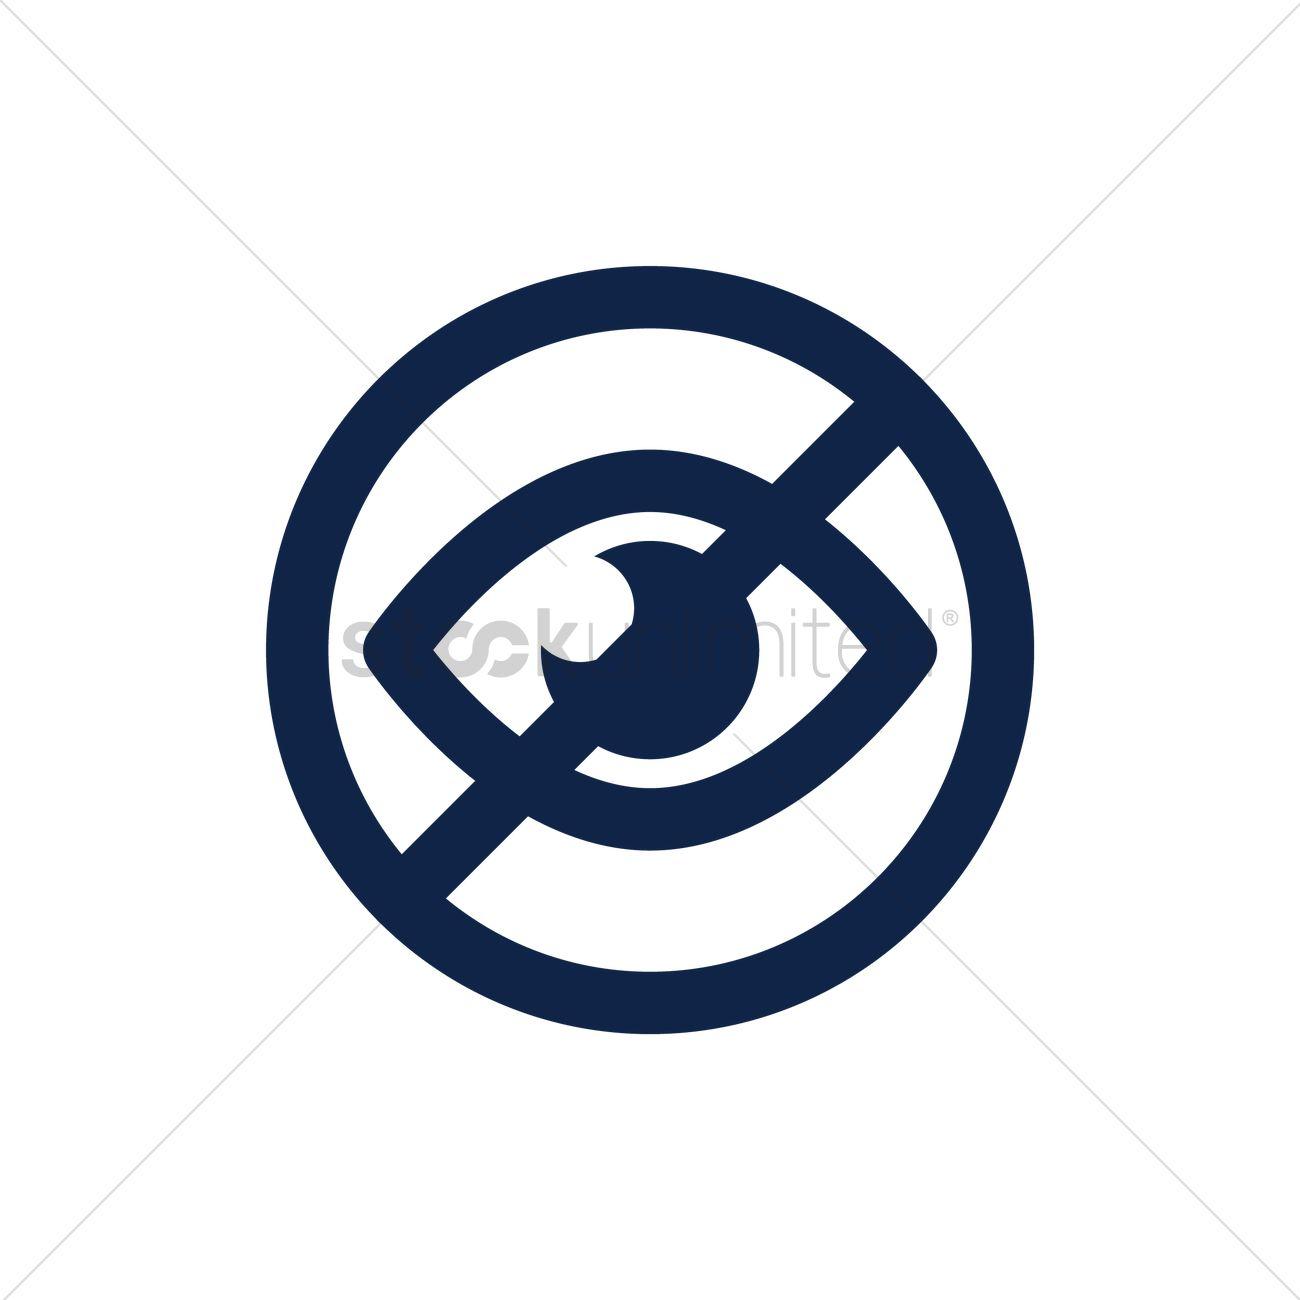 No visibility icon Vector Image.